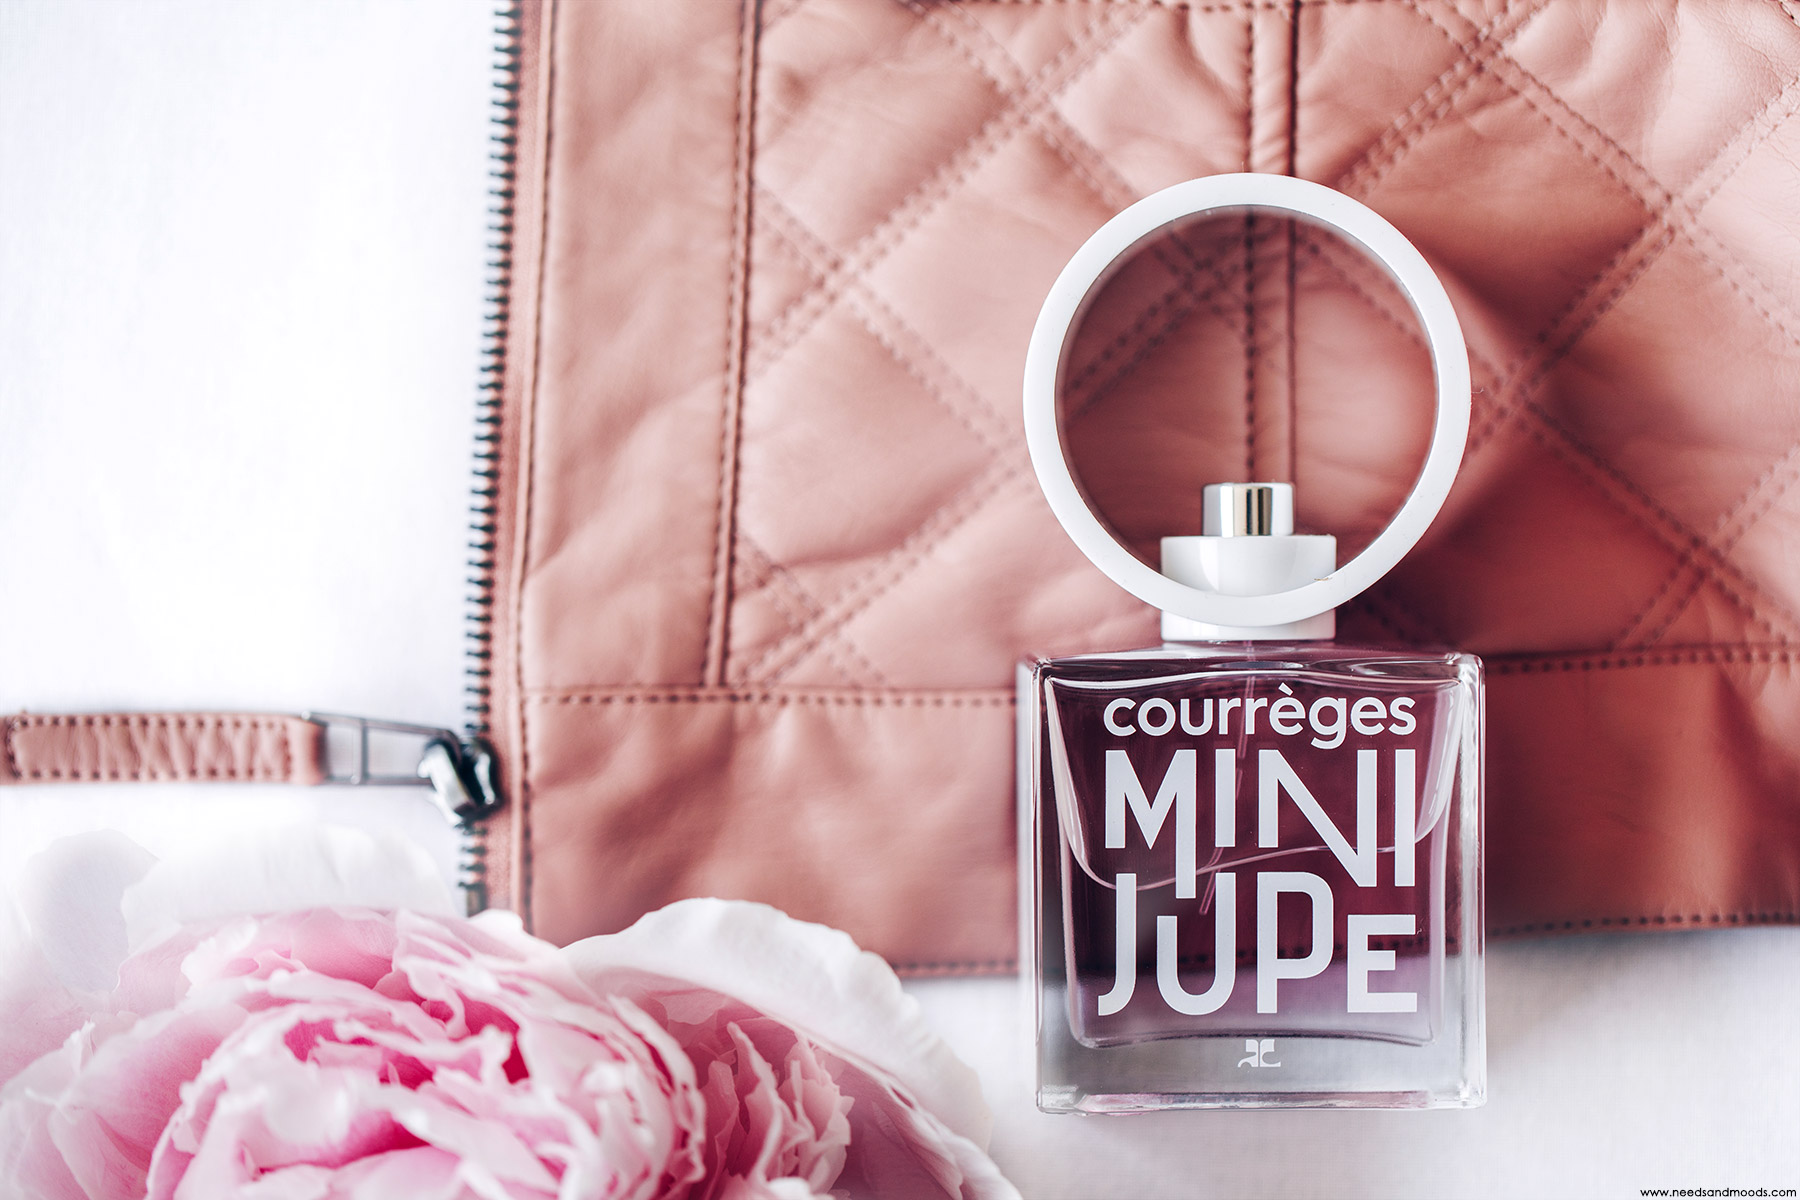 courreges mini jupe parfum avis